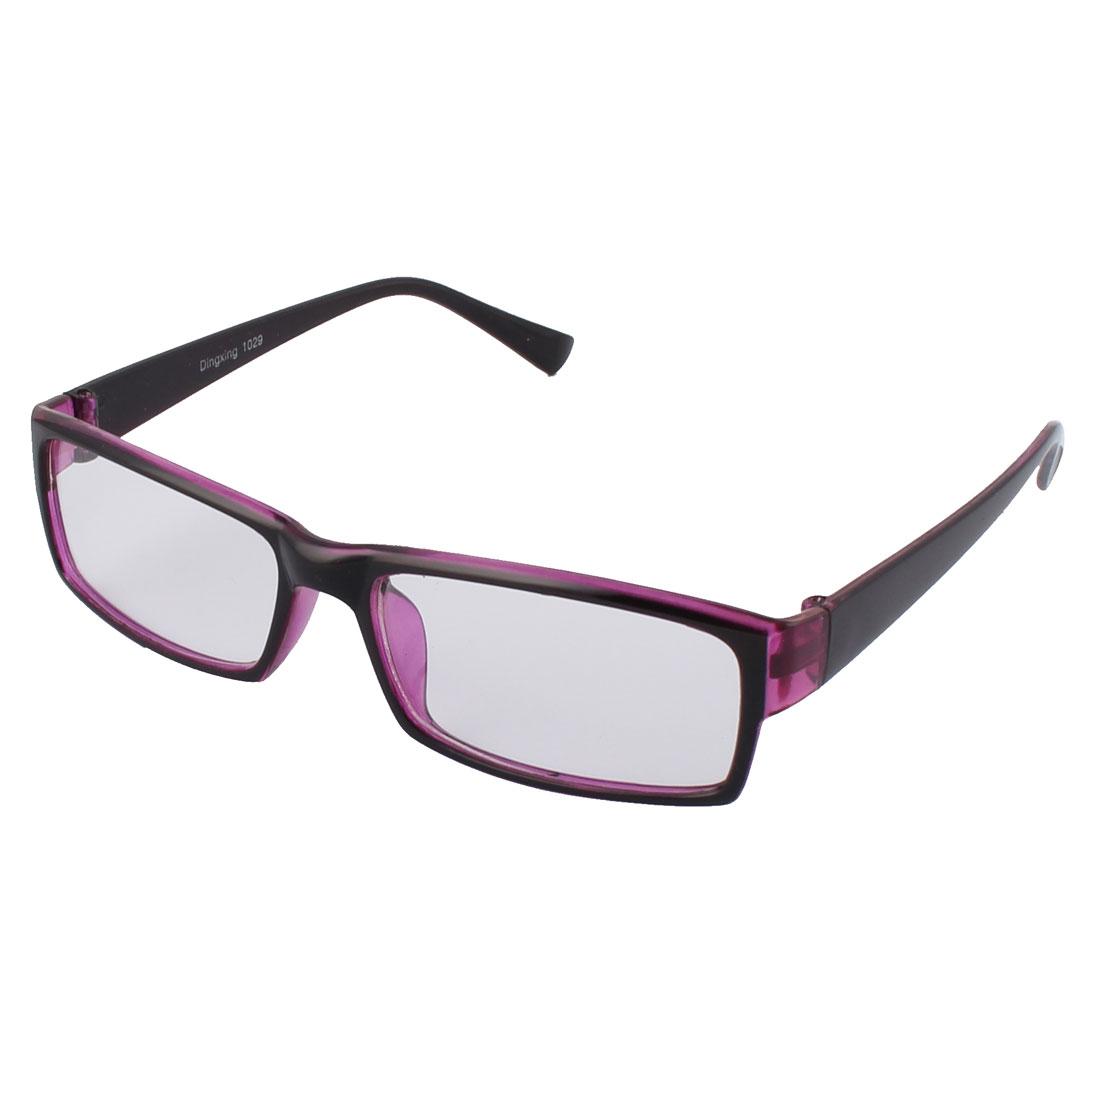 Stylish Clear Lens Light Purple Black Frame Plastic Eyewear Plain Glass